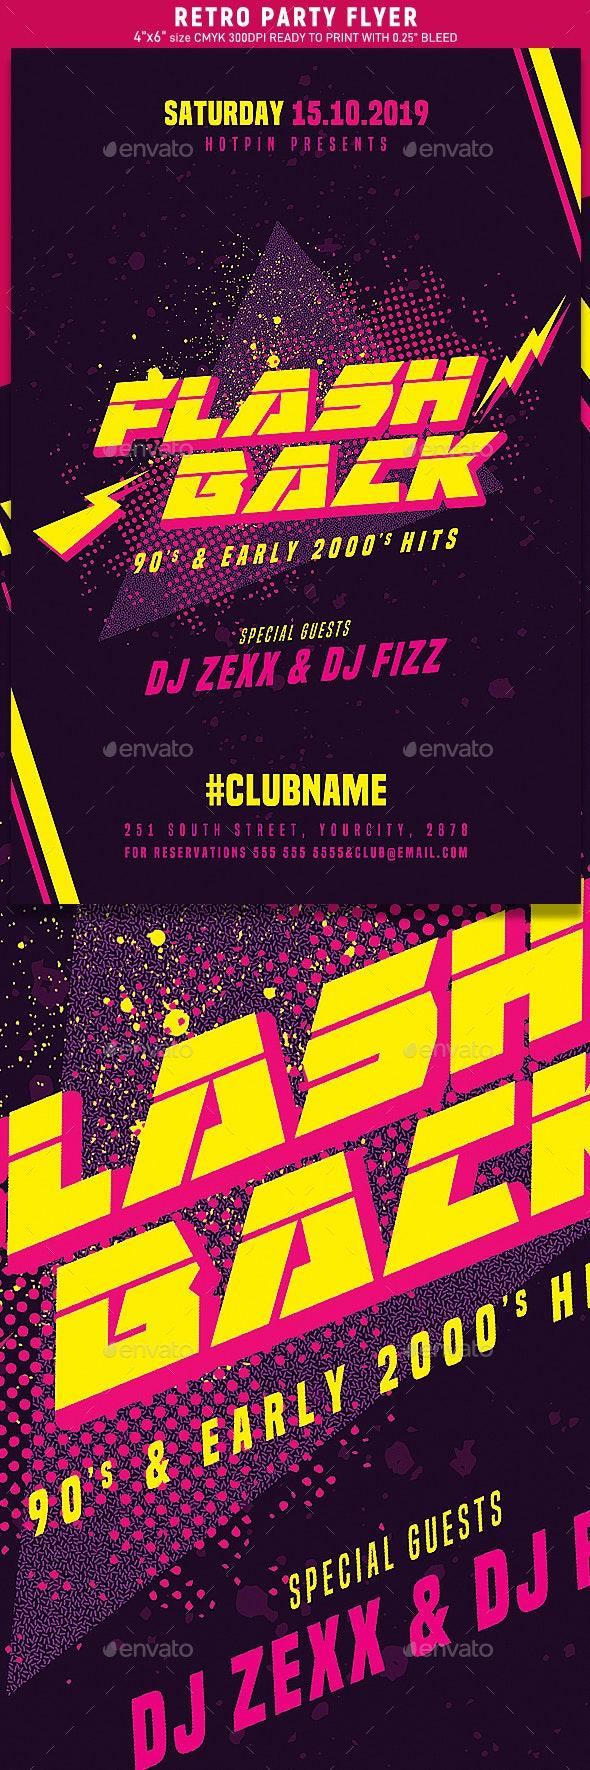 Flashback Retro Party Flyer - Events Flyers